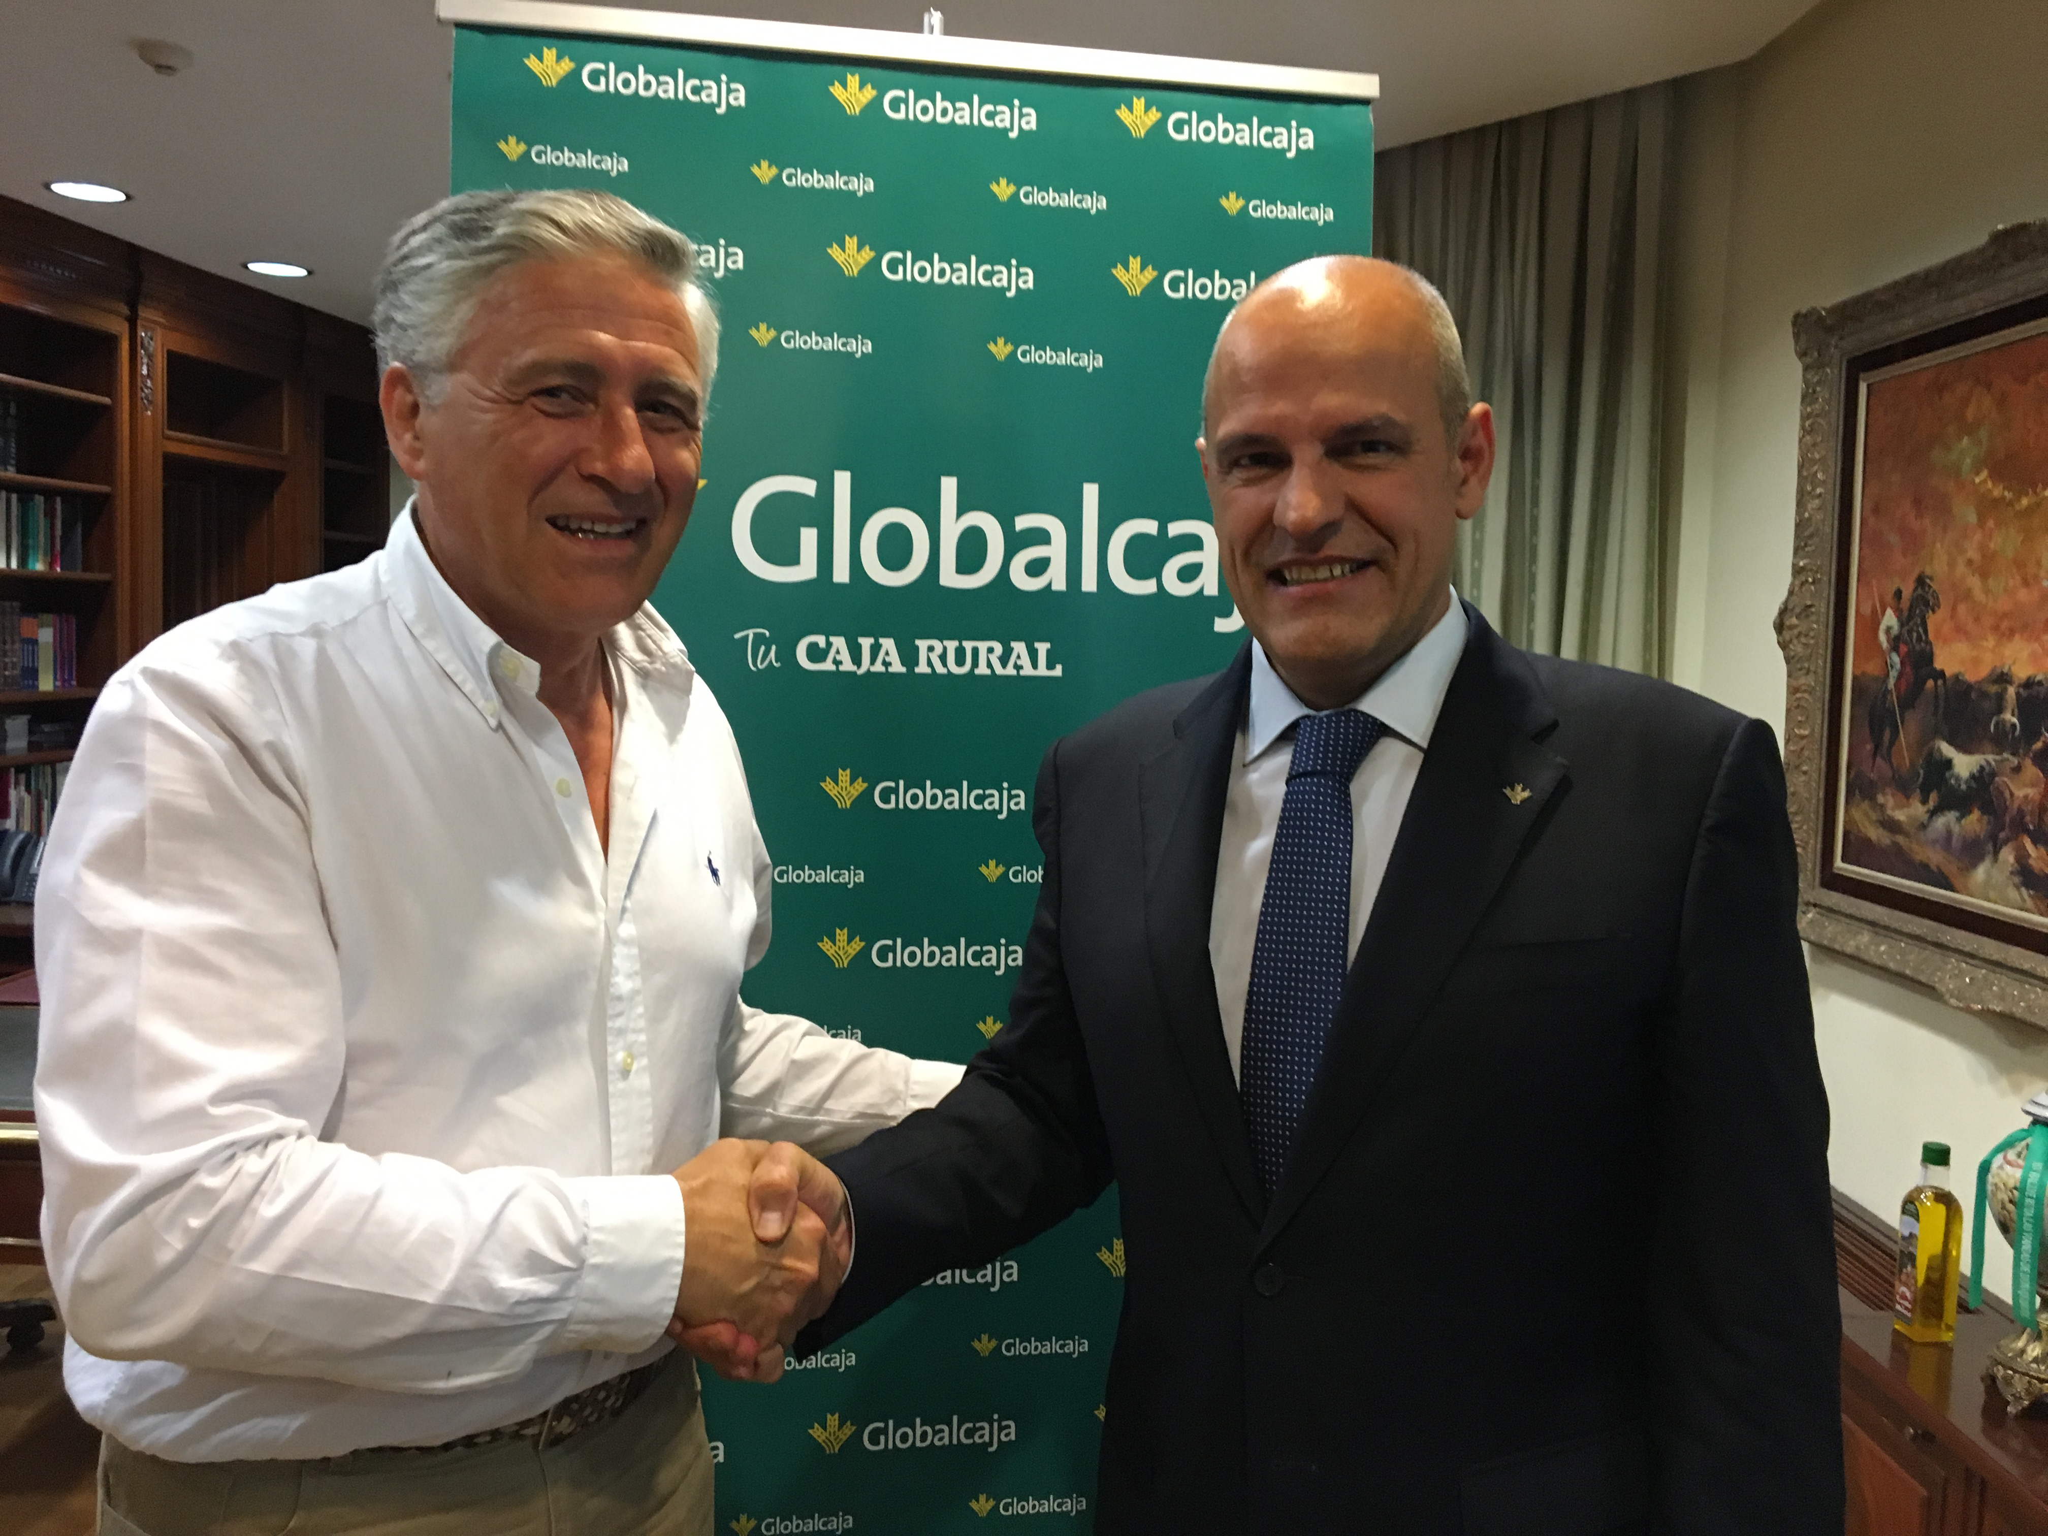 https://blog.globalcaja.es/wp-content/uploads/2016/08/IMG_0900.jpg